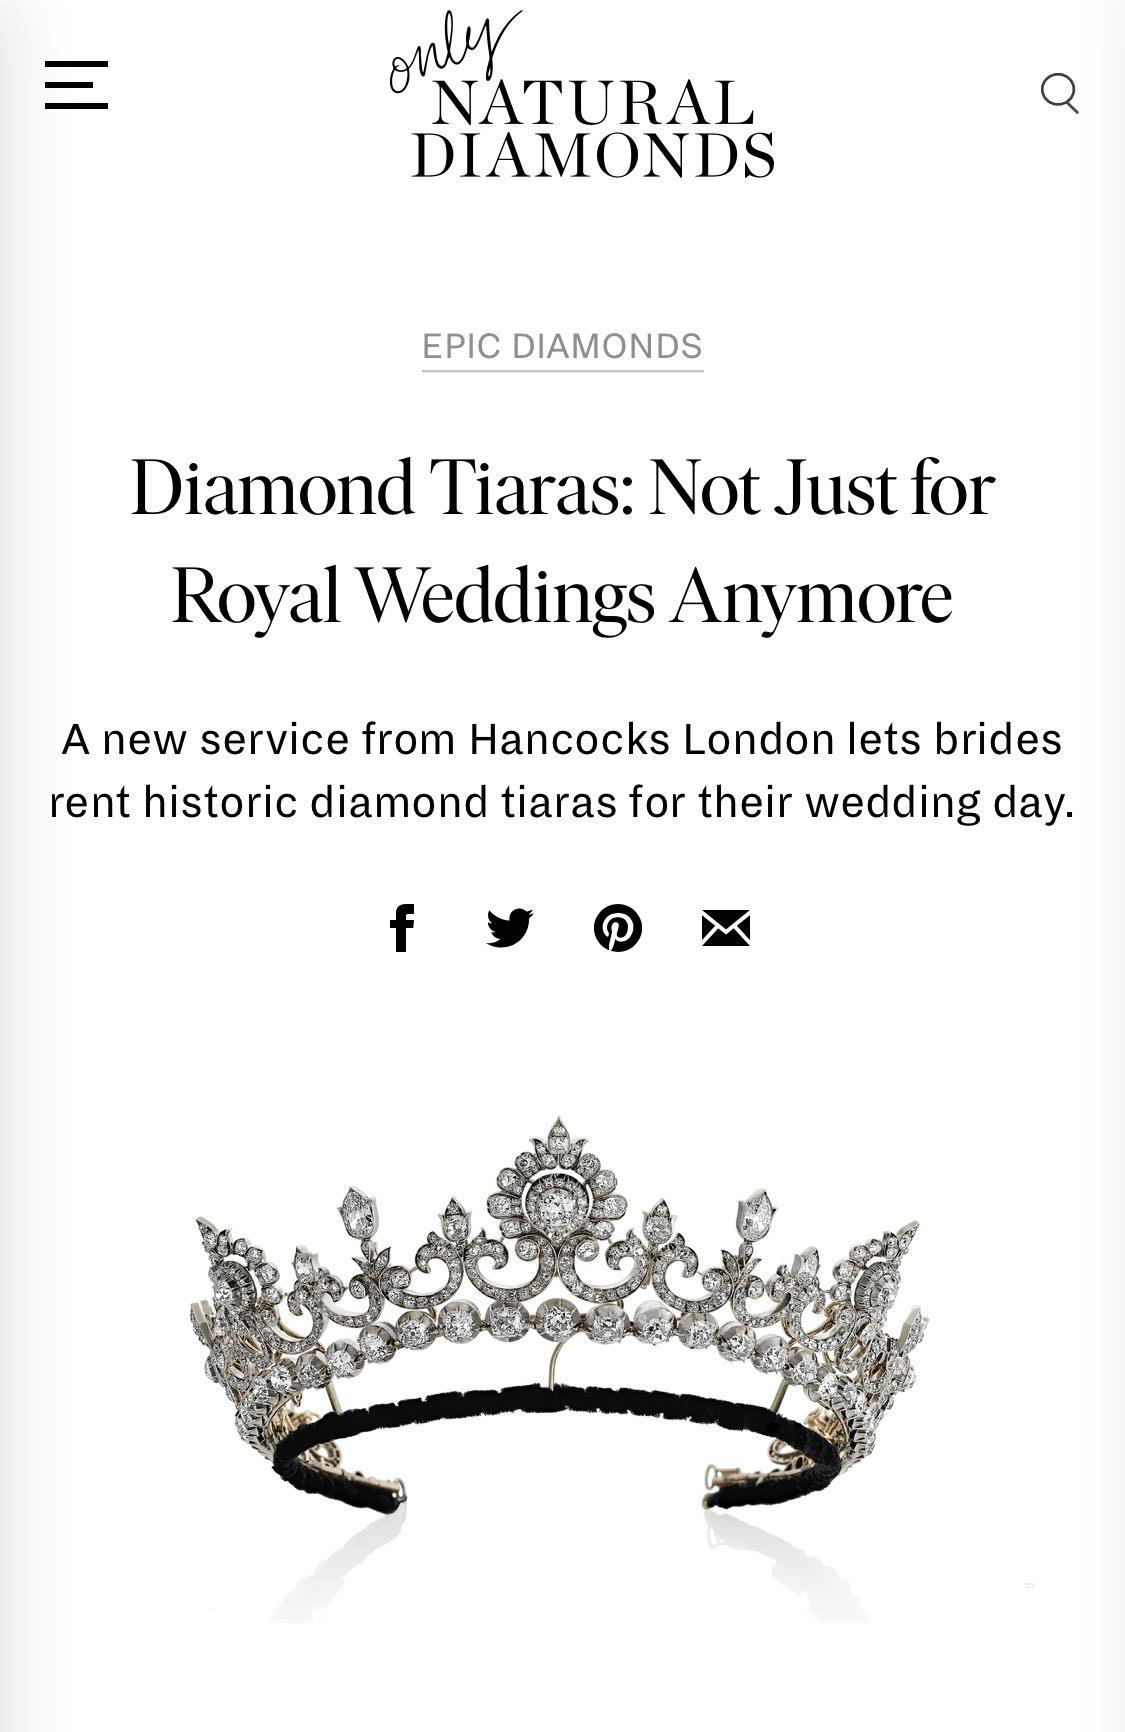 TALKING TIARAS WITH THE NATURAL DIAMOND COUNCIL